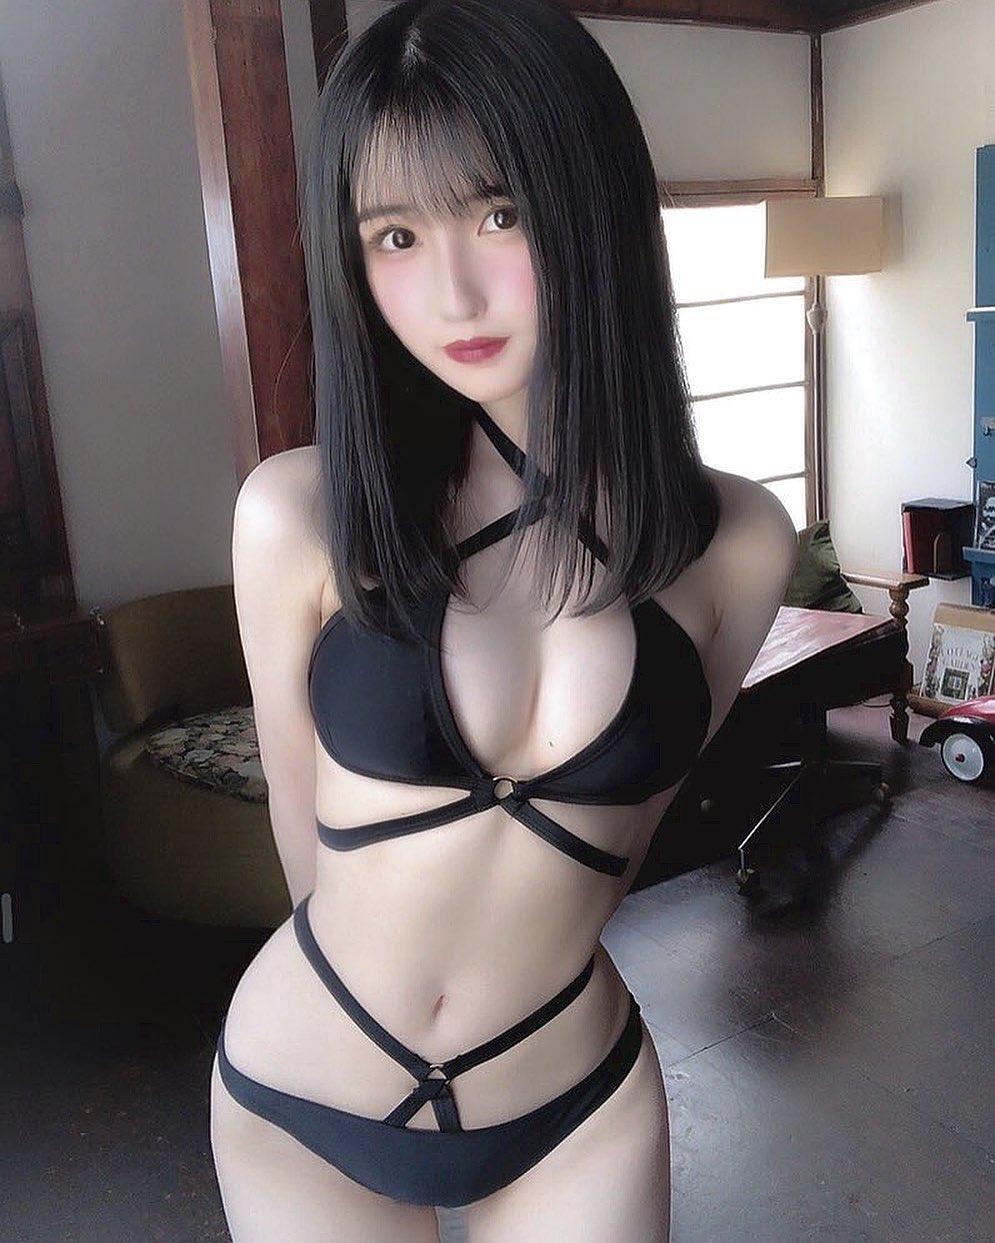 uC7yGS - IG正妹—森嶋あんり